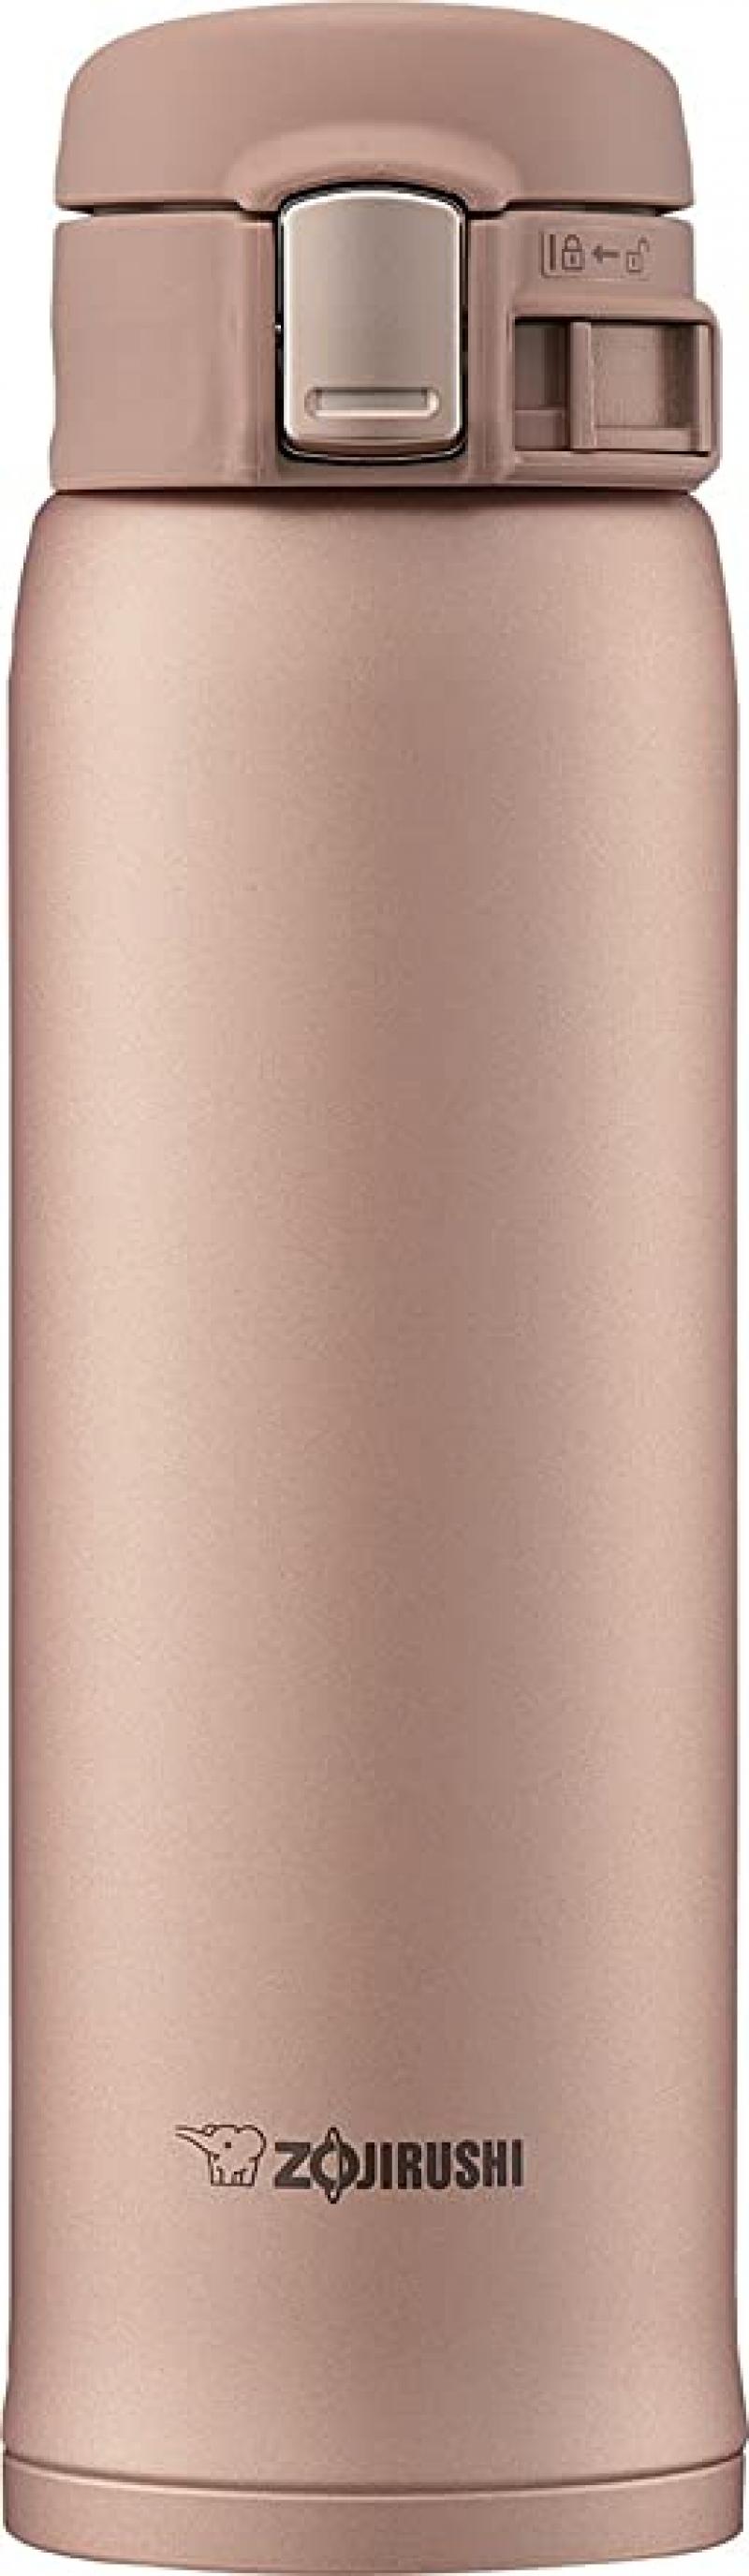 ihocon: Zojirushi SM-SD48NM Stainless Steel Vacuum Insulated Mug, 16-Ounce, Matte Gold  象印不銹鋼保溫杯